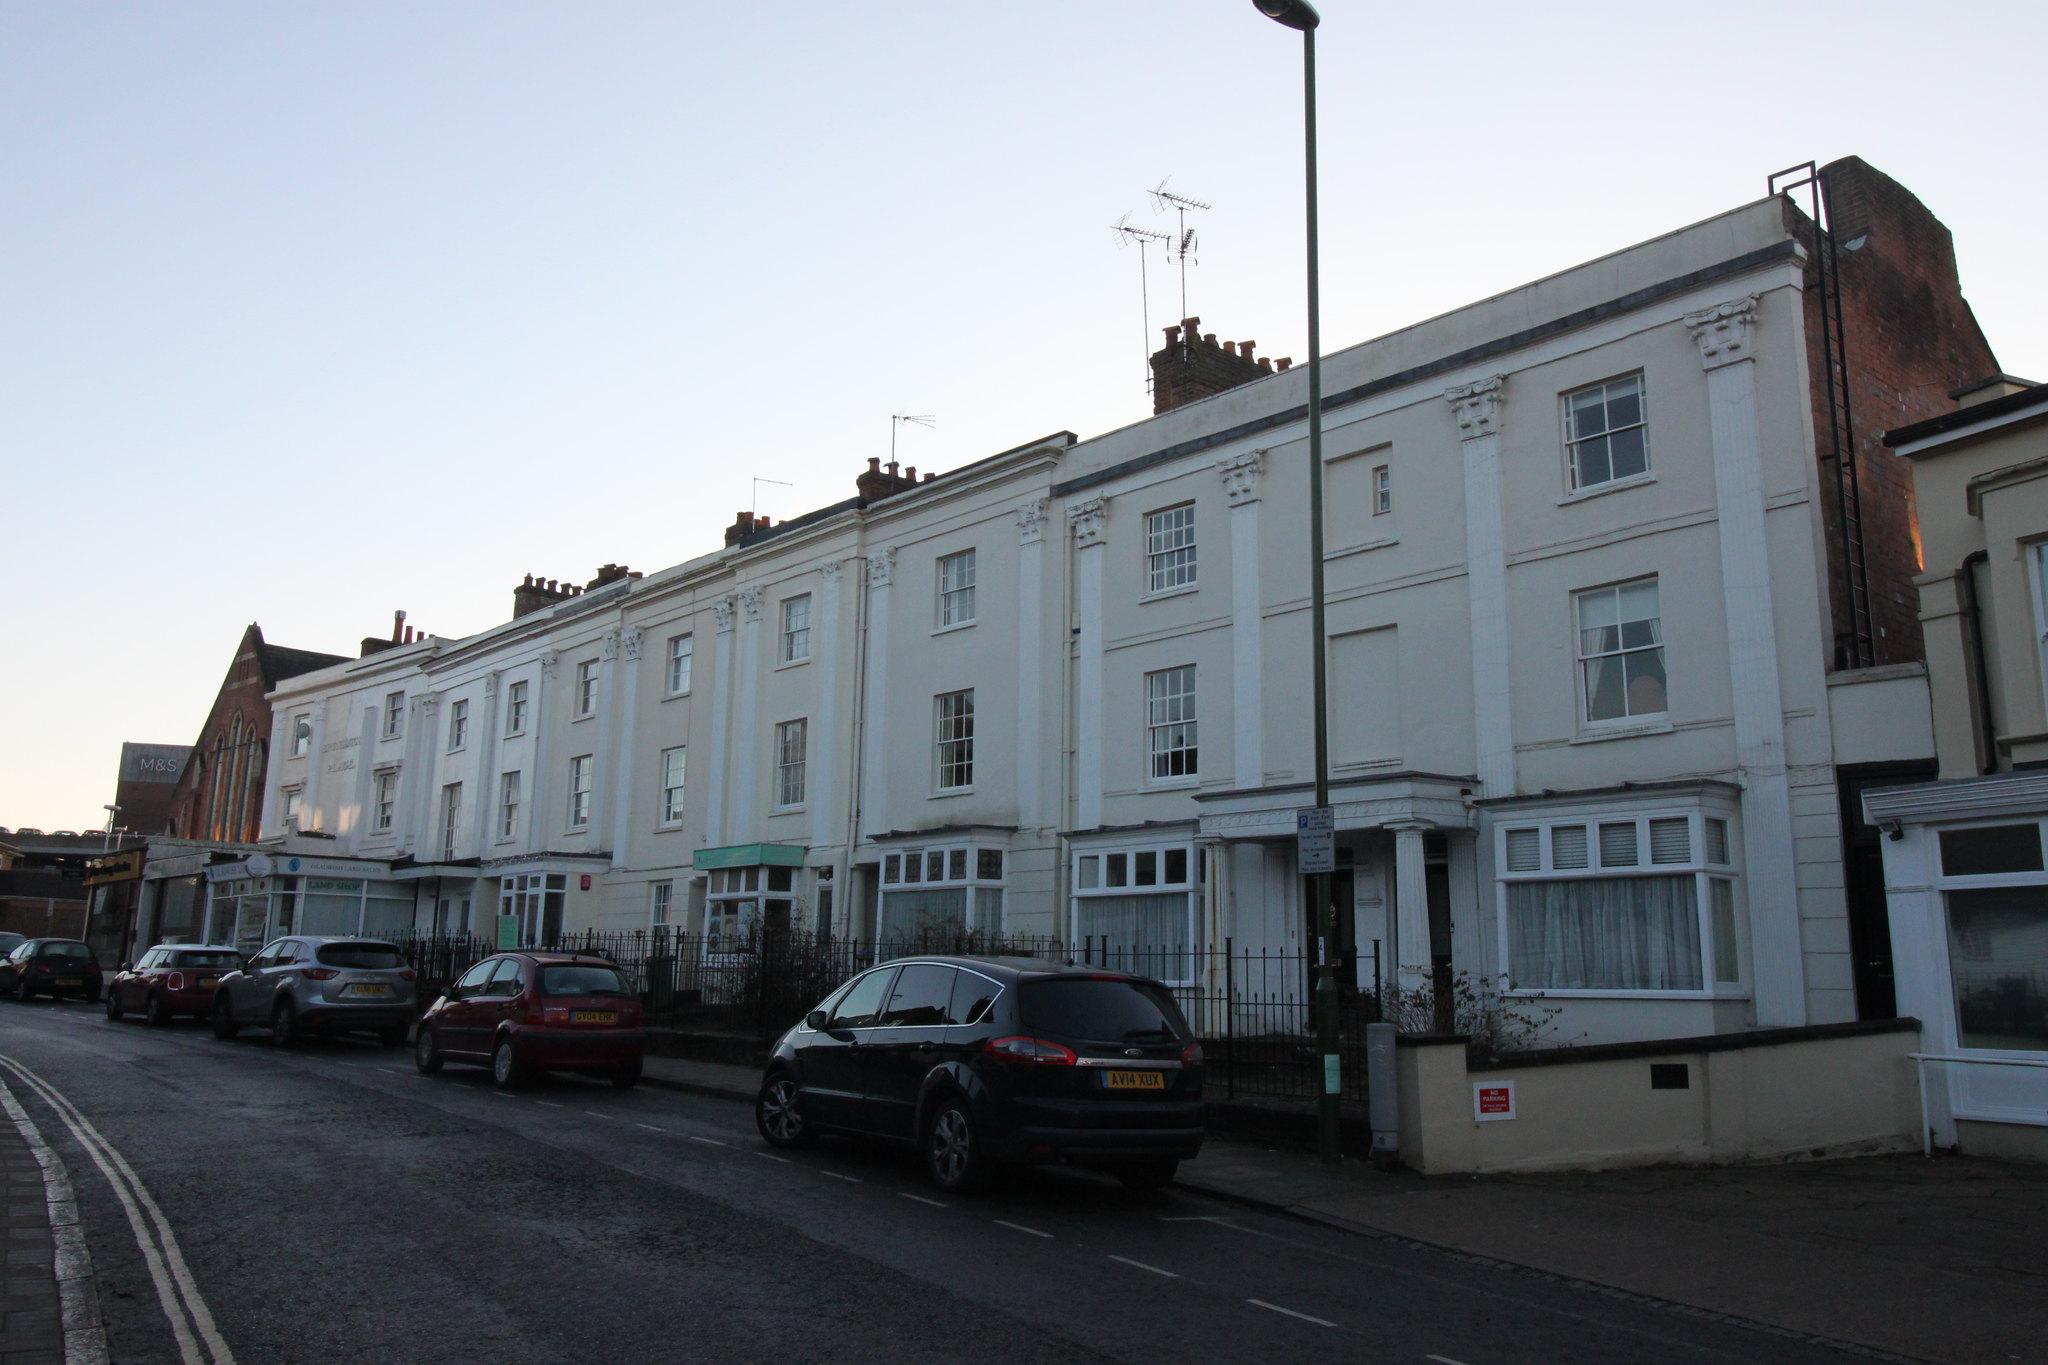 Brunswick Place, Horsham, West Sussex